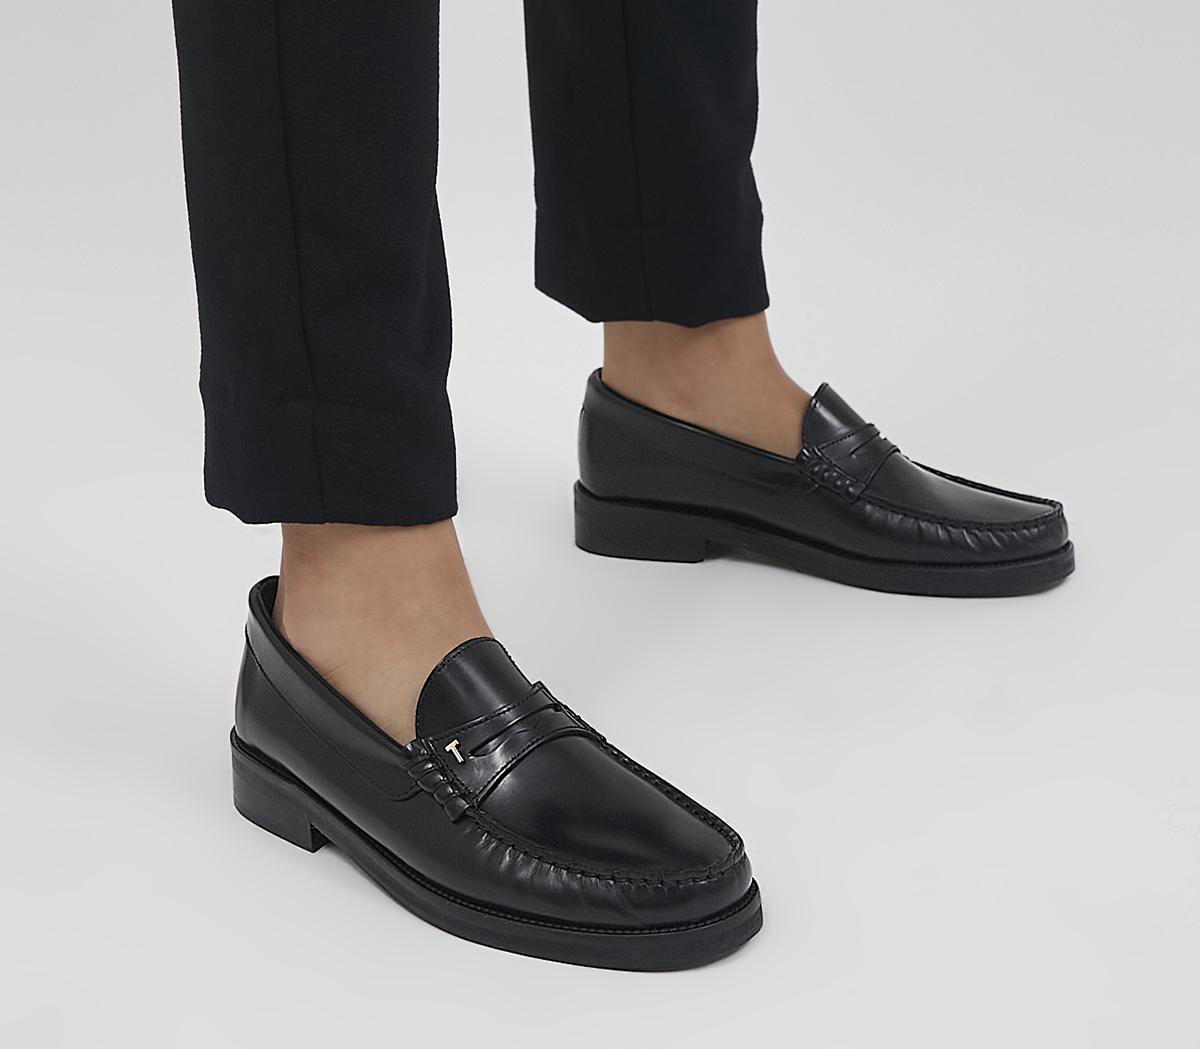 Edahn Loafers